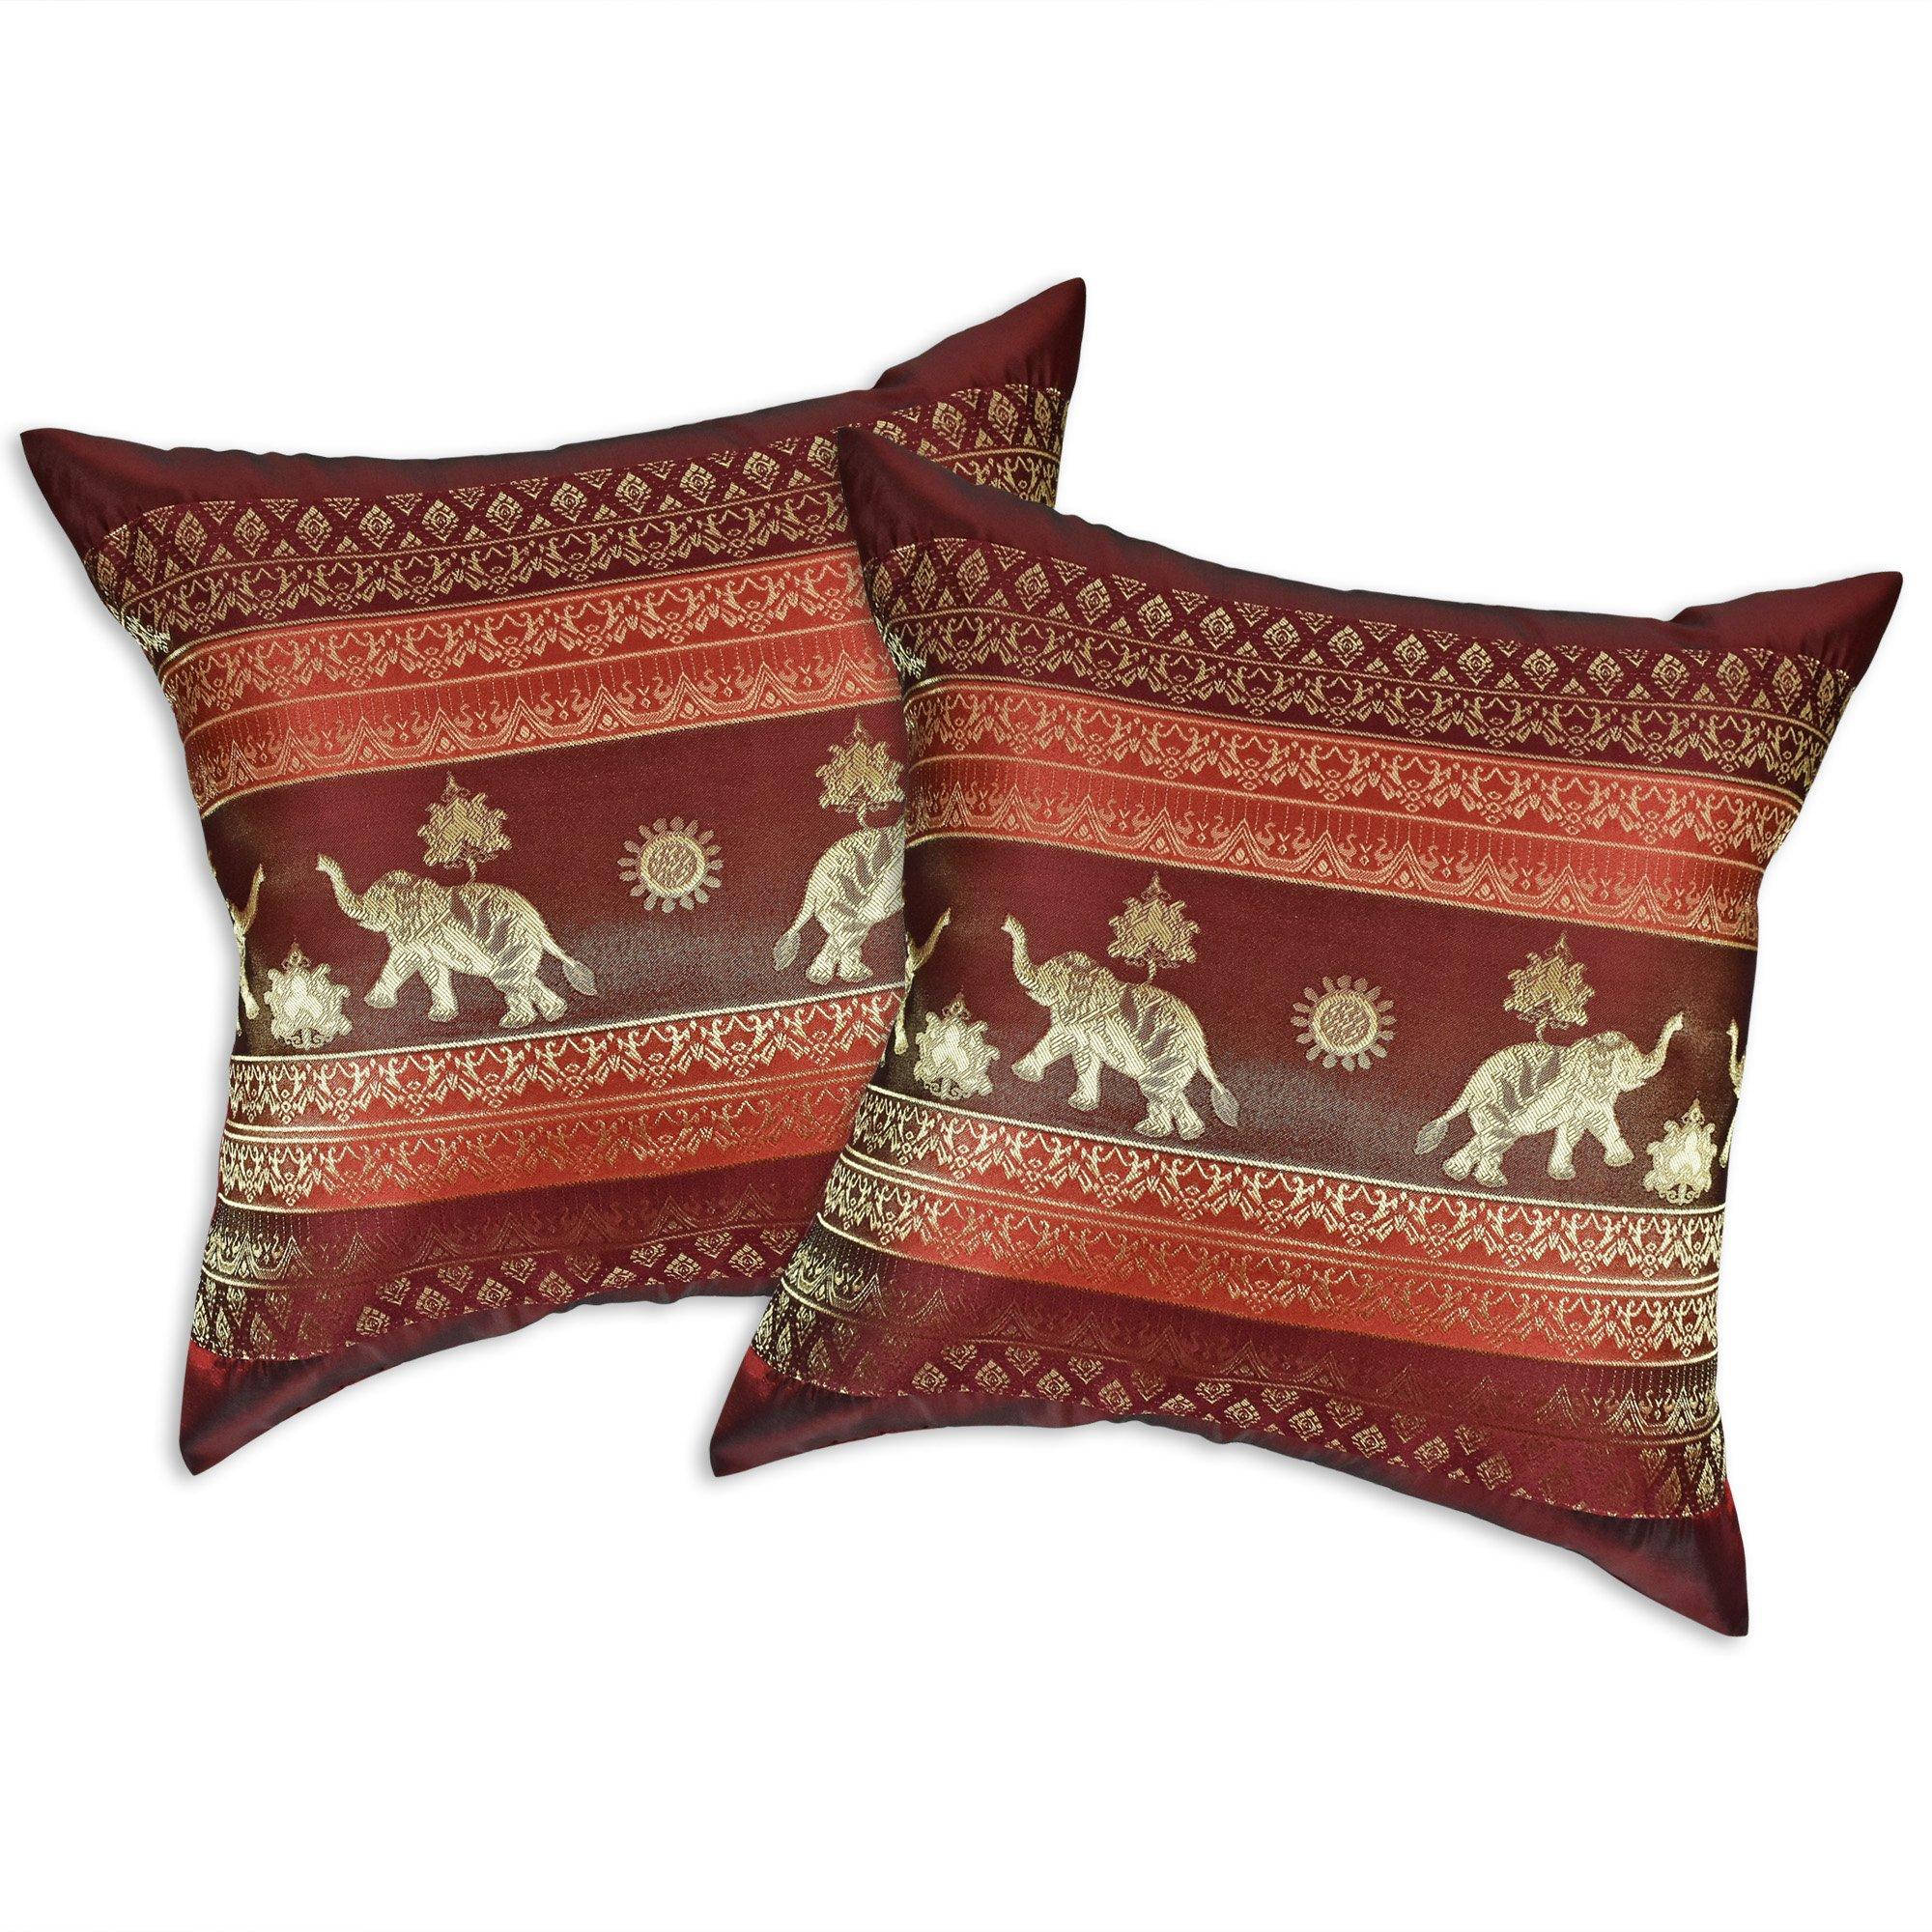 AeraVida Red Wine Thai Elephant Sun Stripes Silk Throw Pillow Cushion Cover Set (Red) by AeraVida